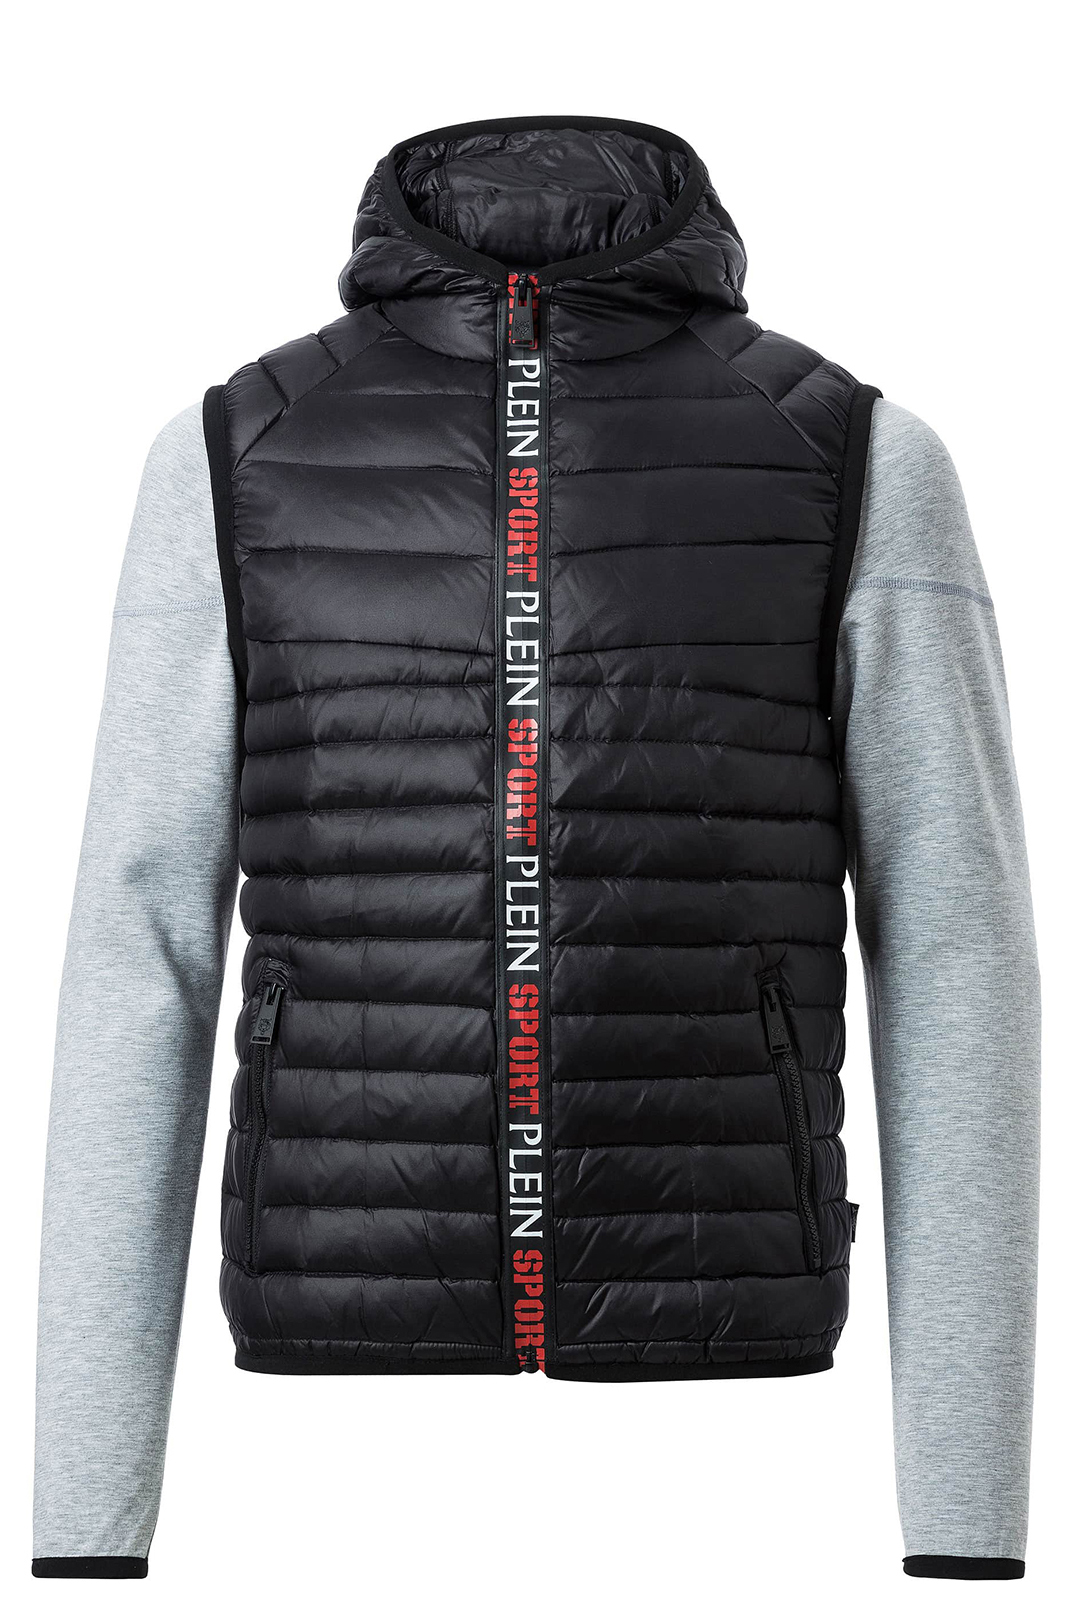 Vestes zippées  Plein Sport F17C MRB0188 02 BLACK